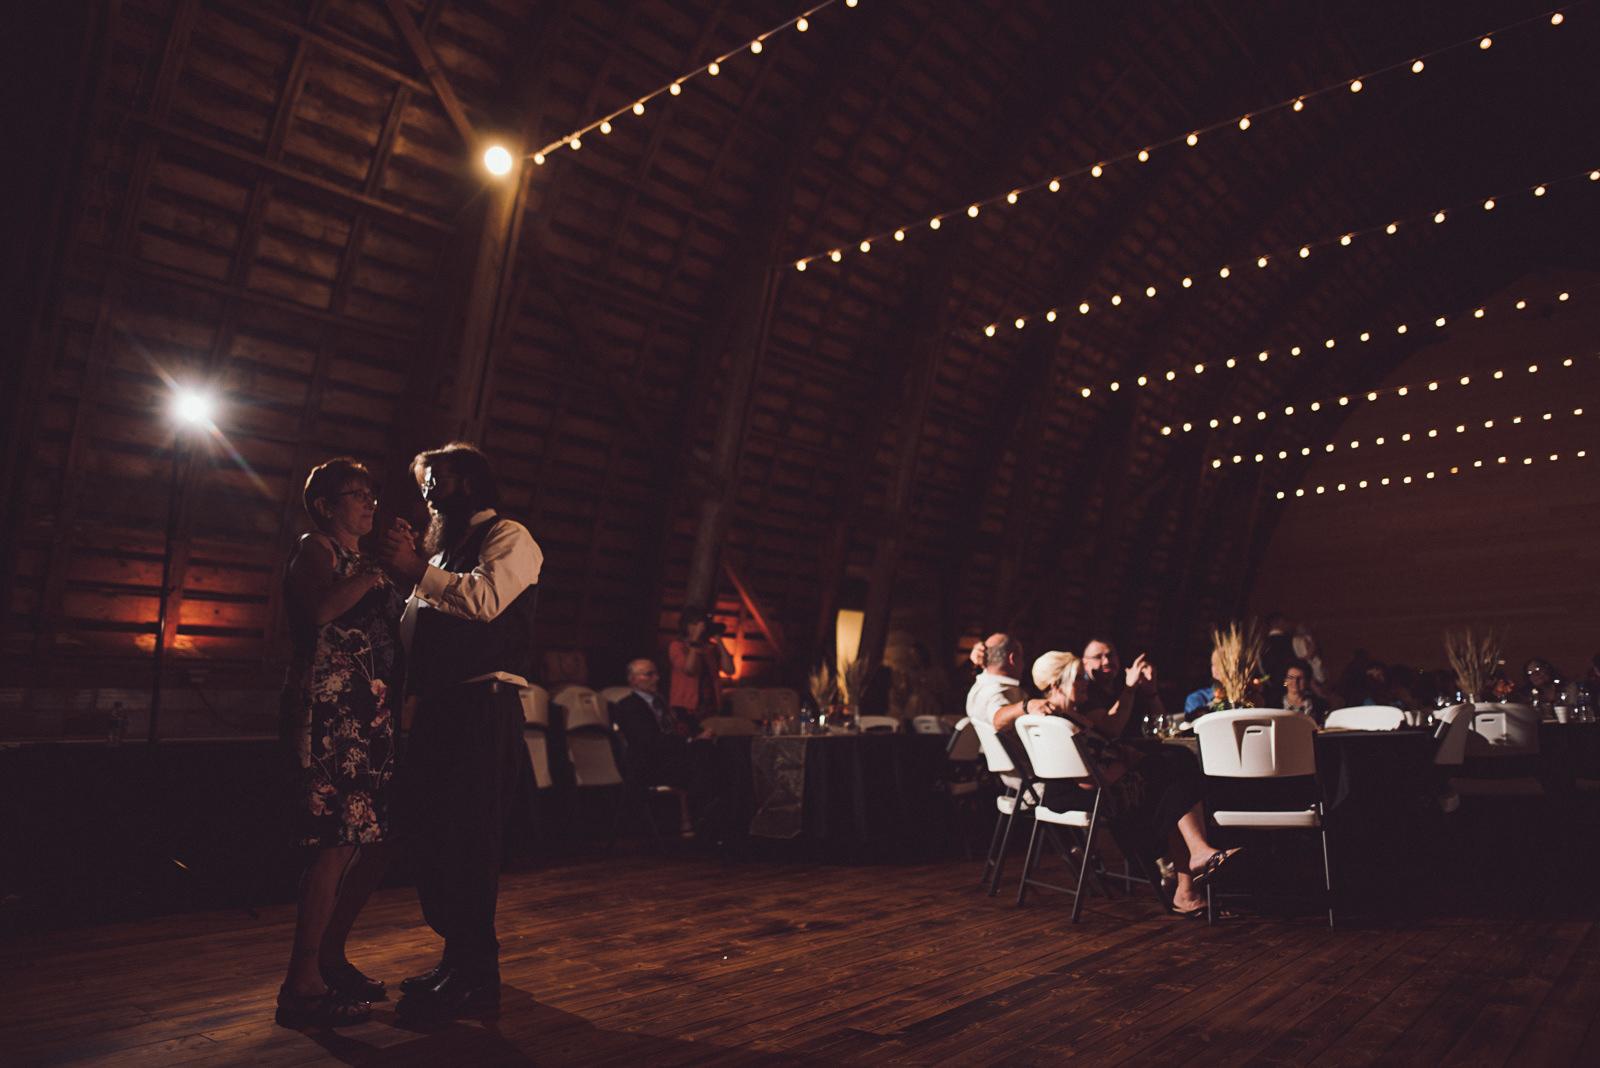 wedding-keely-caleb-2013-name-your-photo.jpg